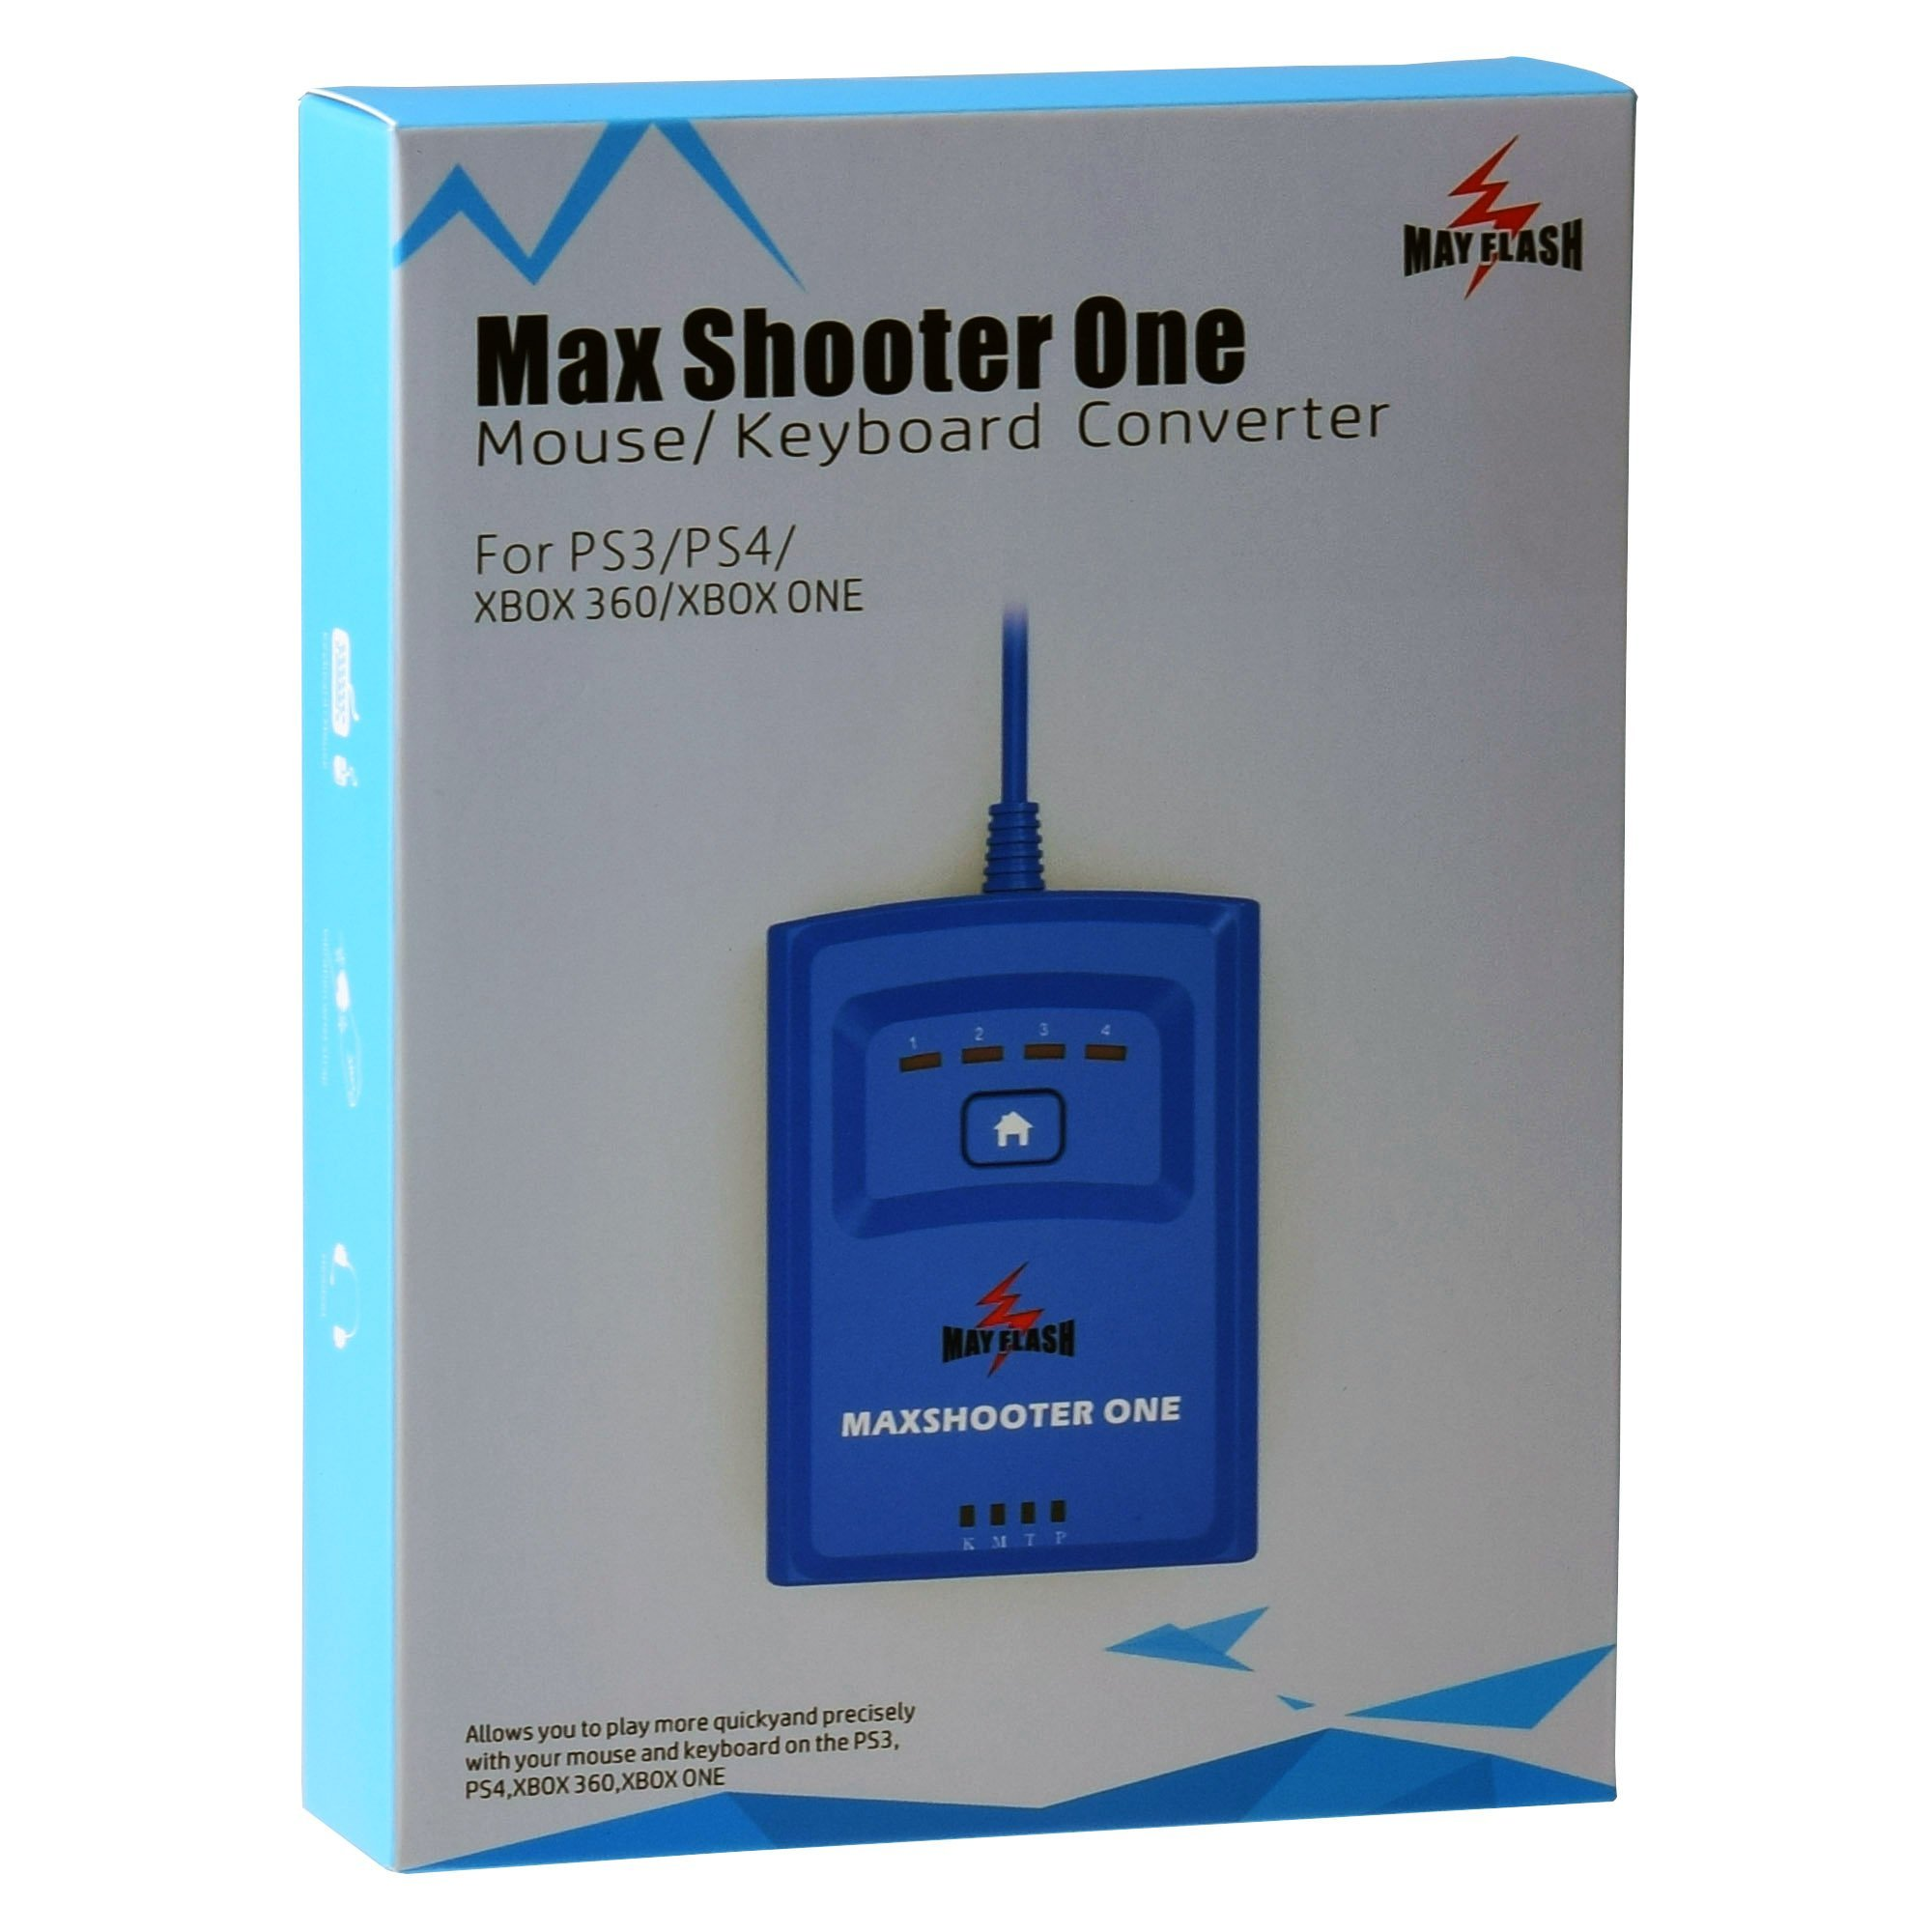 ایگرد - خرید از آمازون | Mayflash Max Shooter One Mouse Keyboard